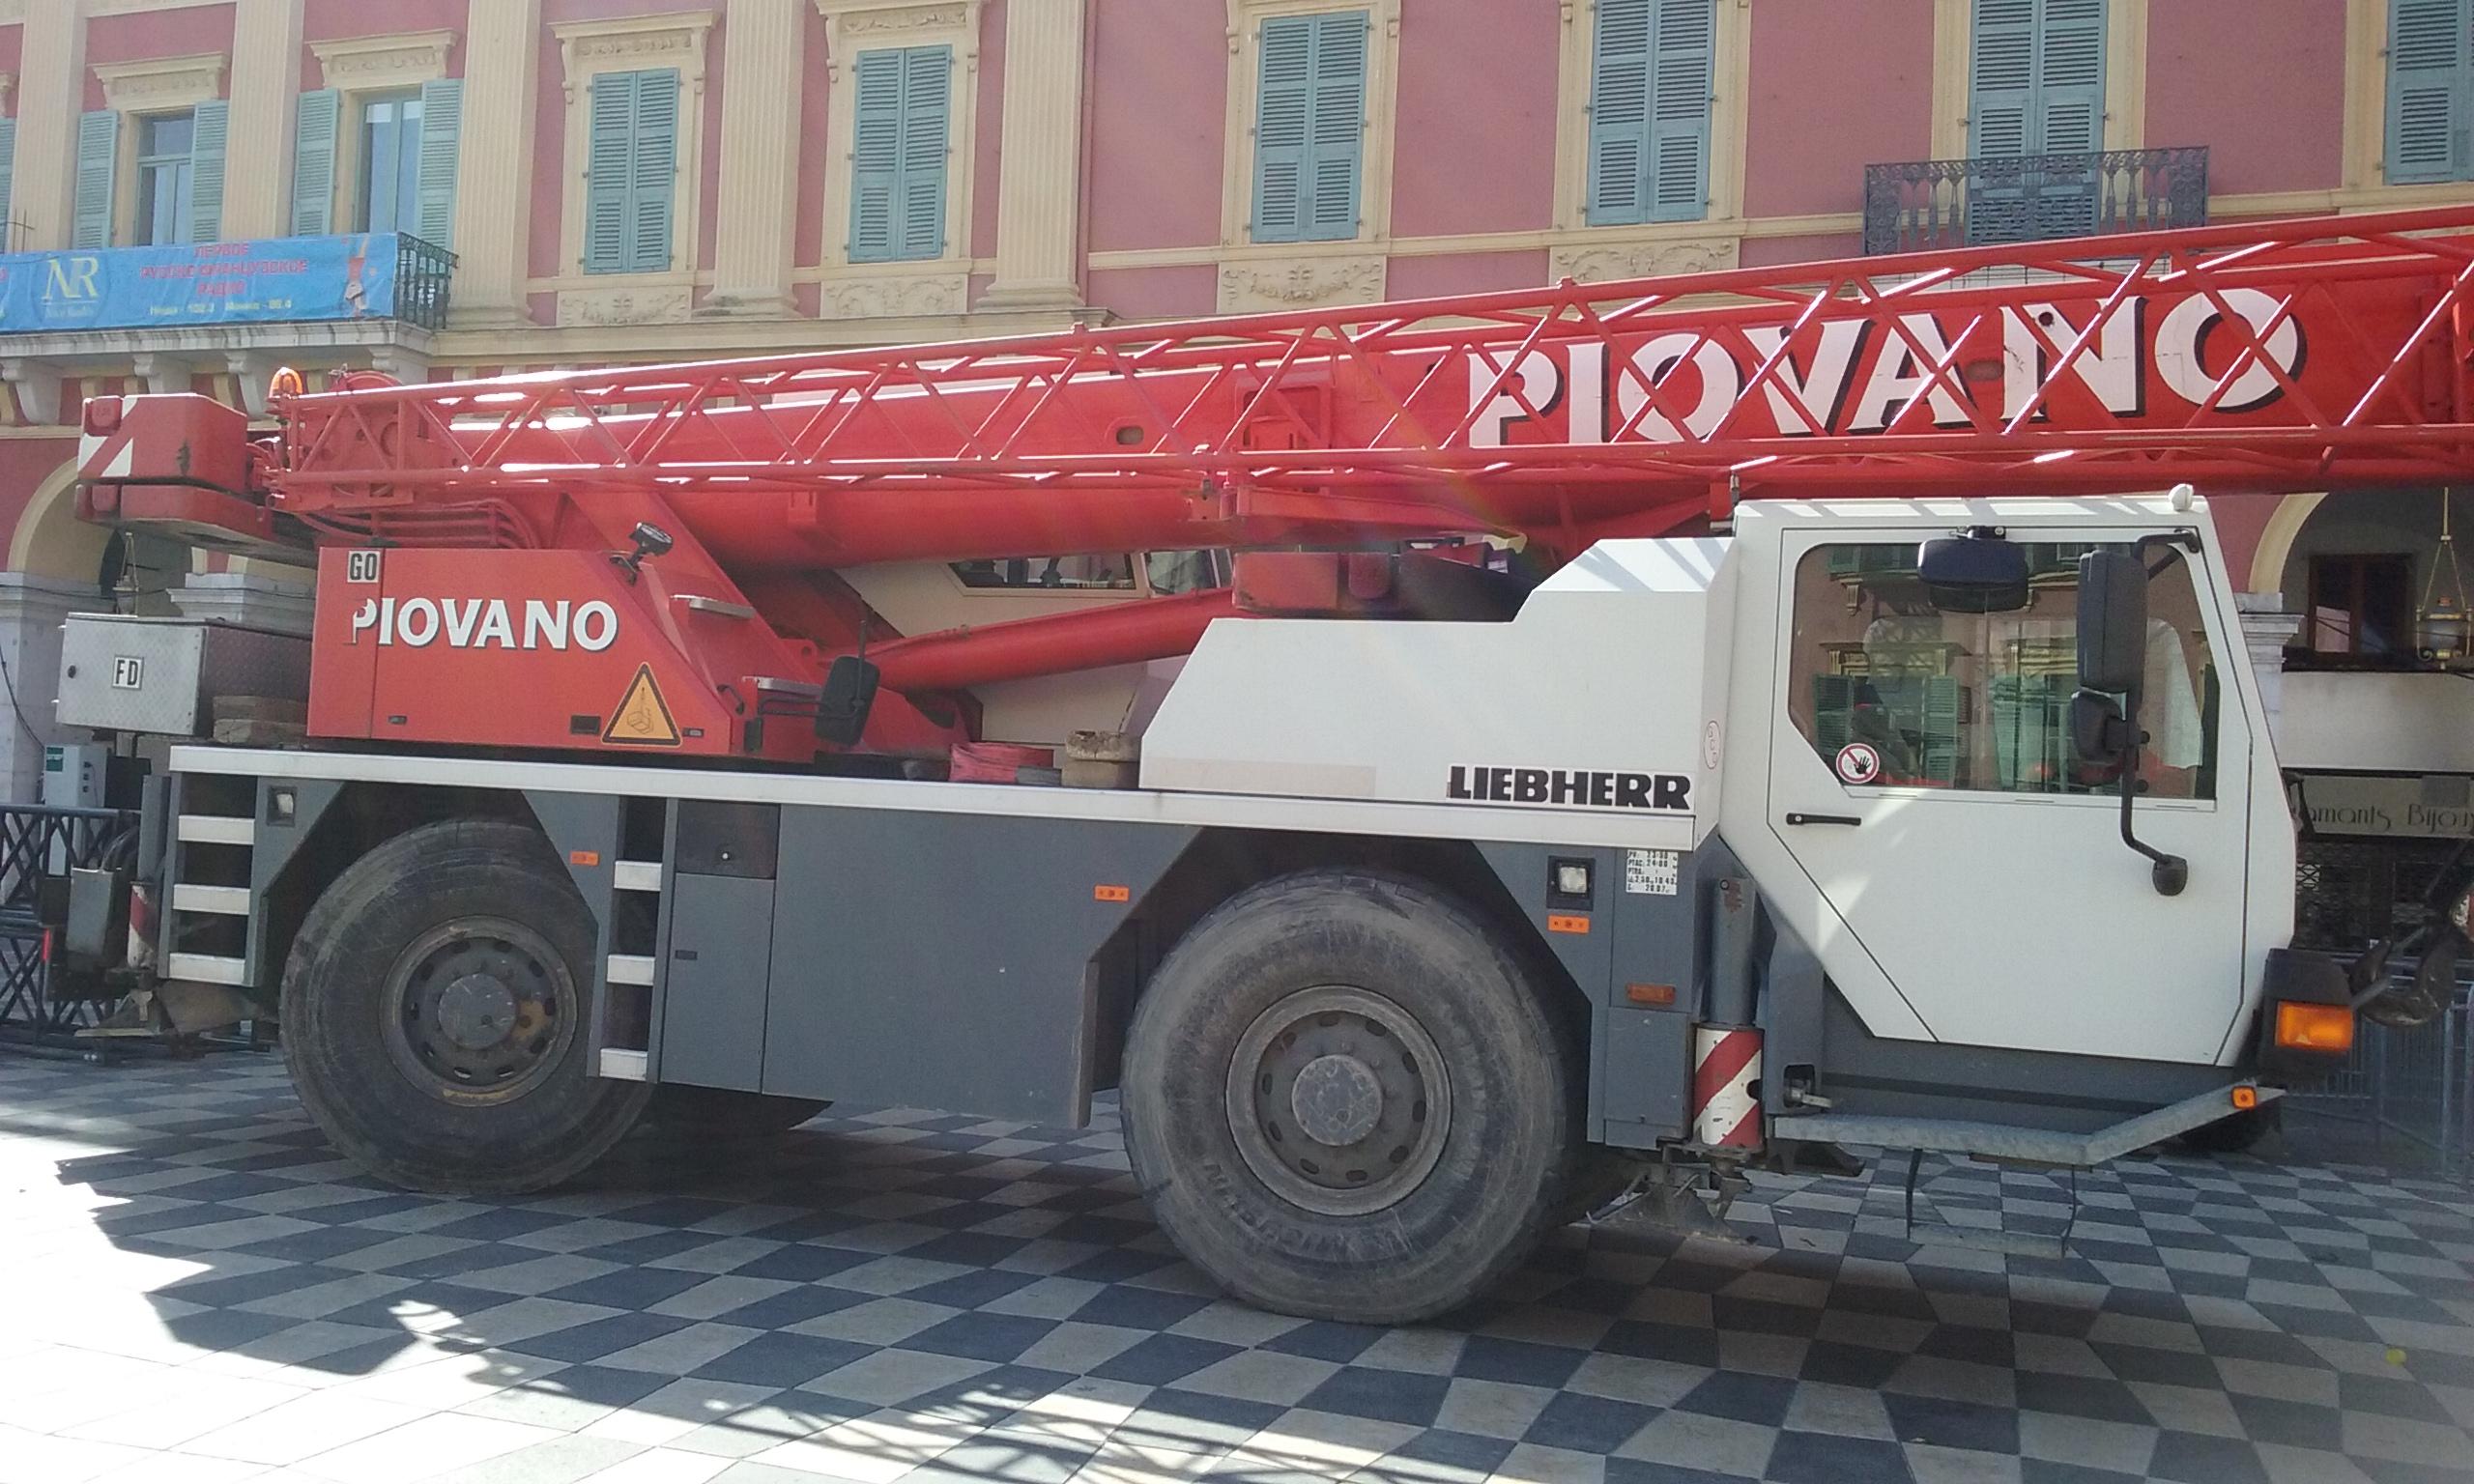 Les Grues de PIOVANO (France & Italie) 58129020160302132811